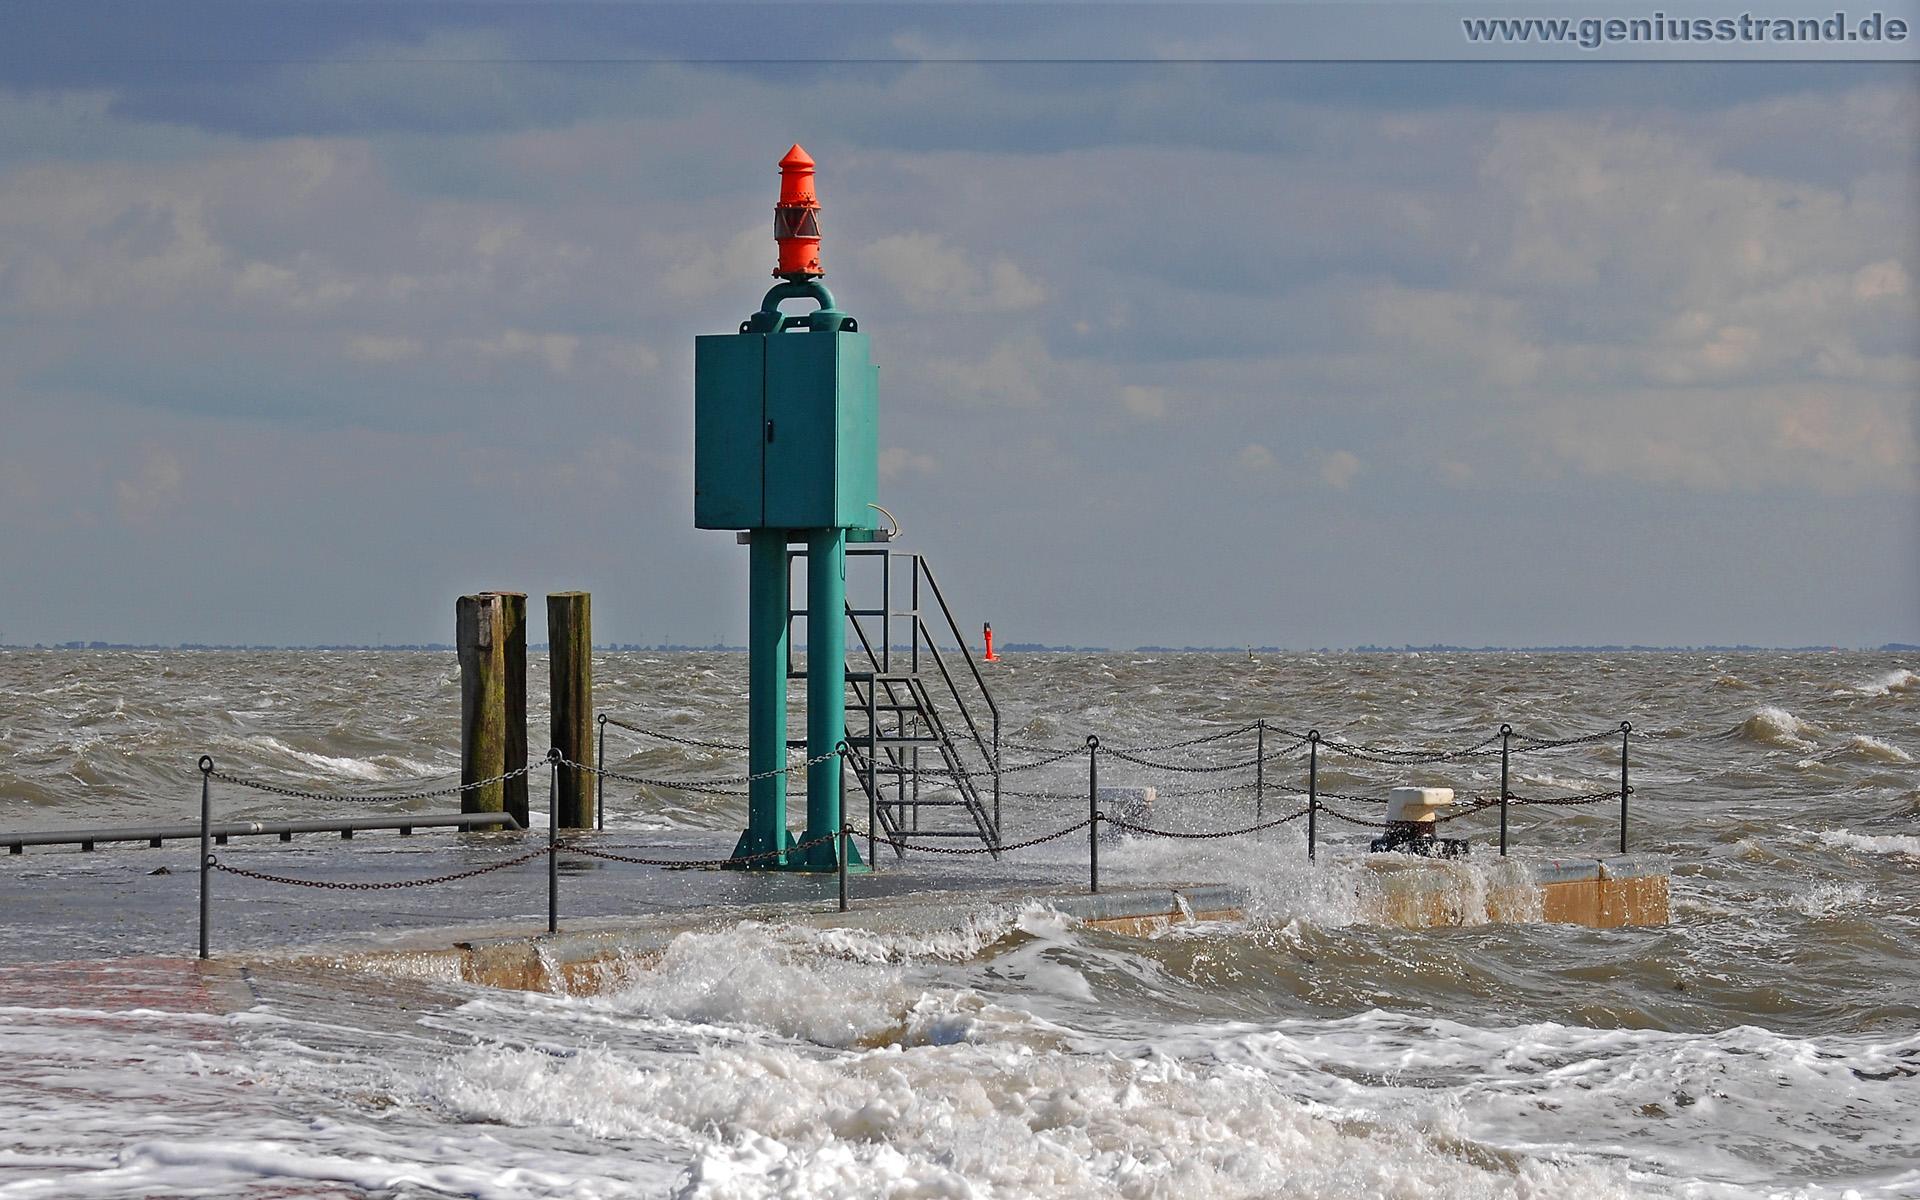 Hintergrundbild – Mole am Helgolandkai in Wilhelmshaven